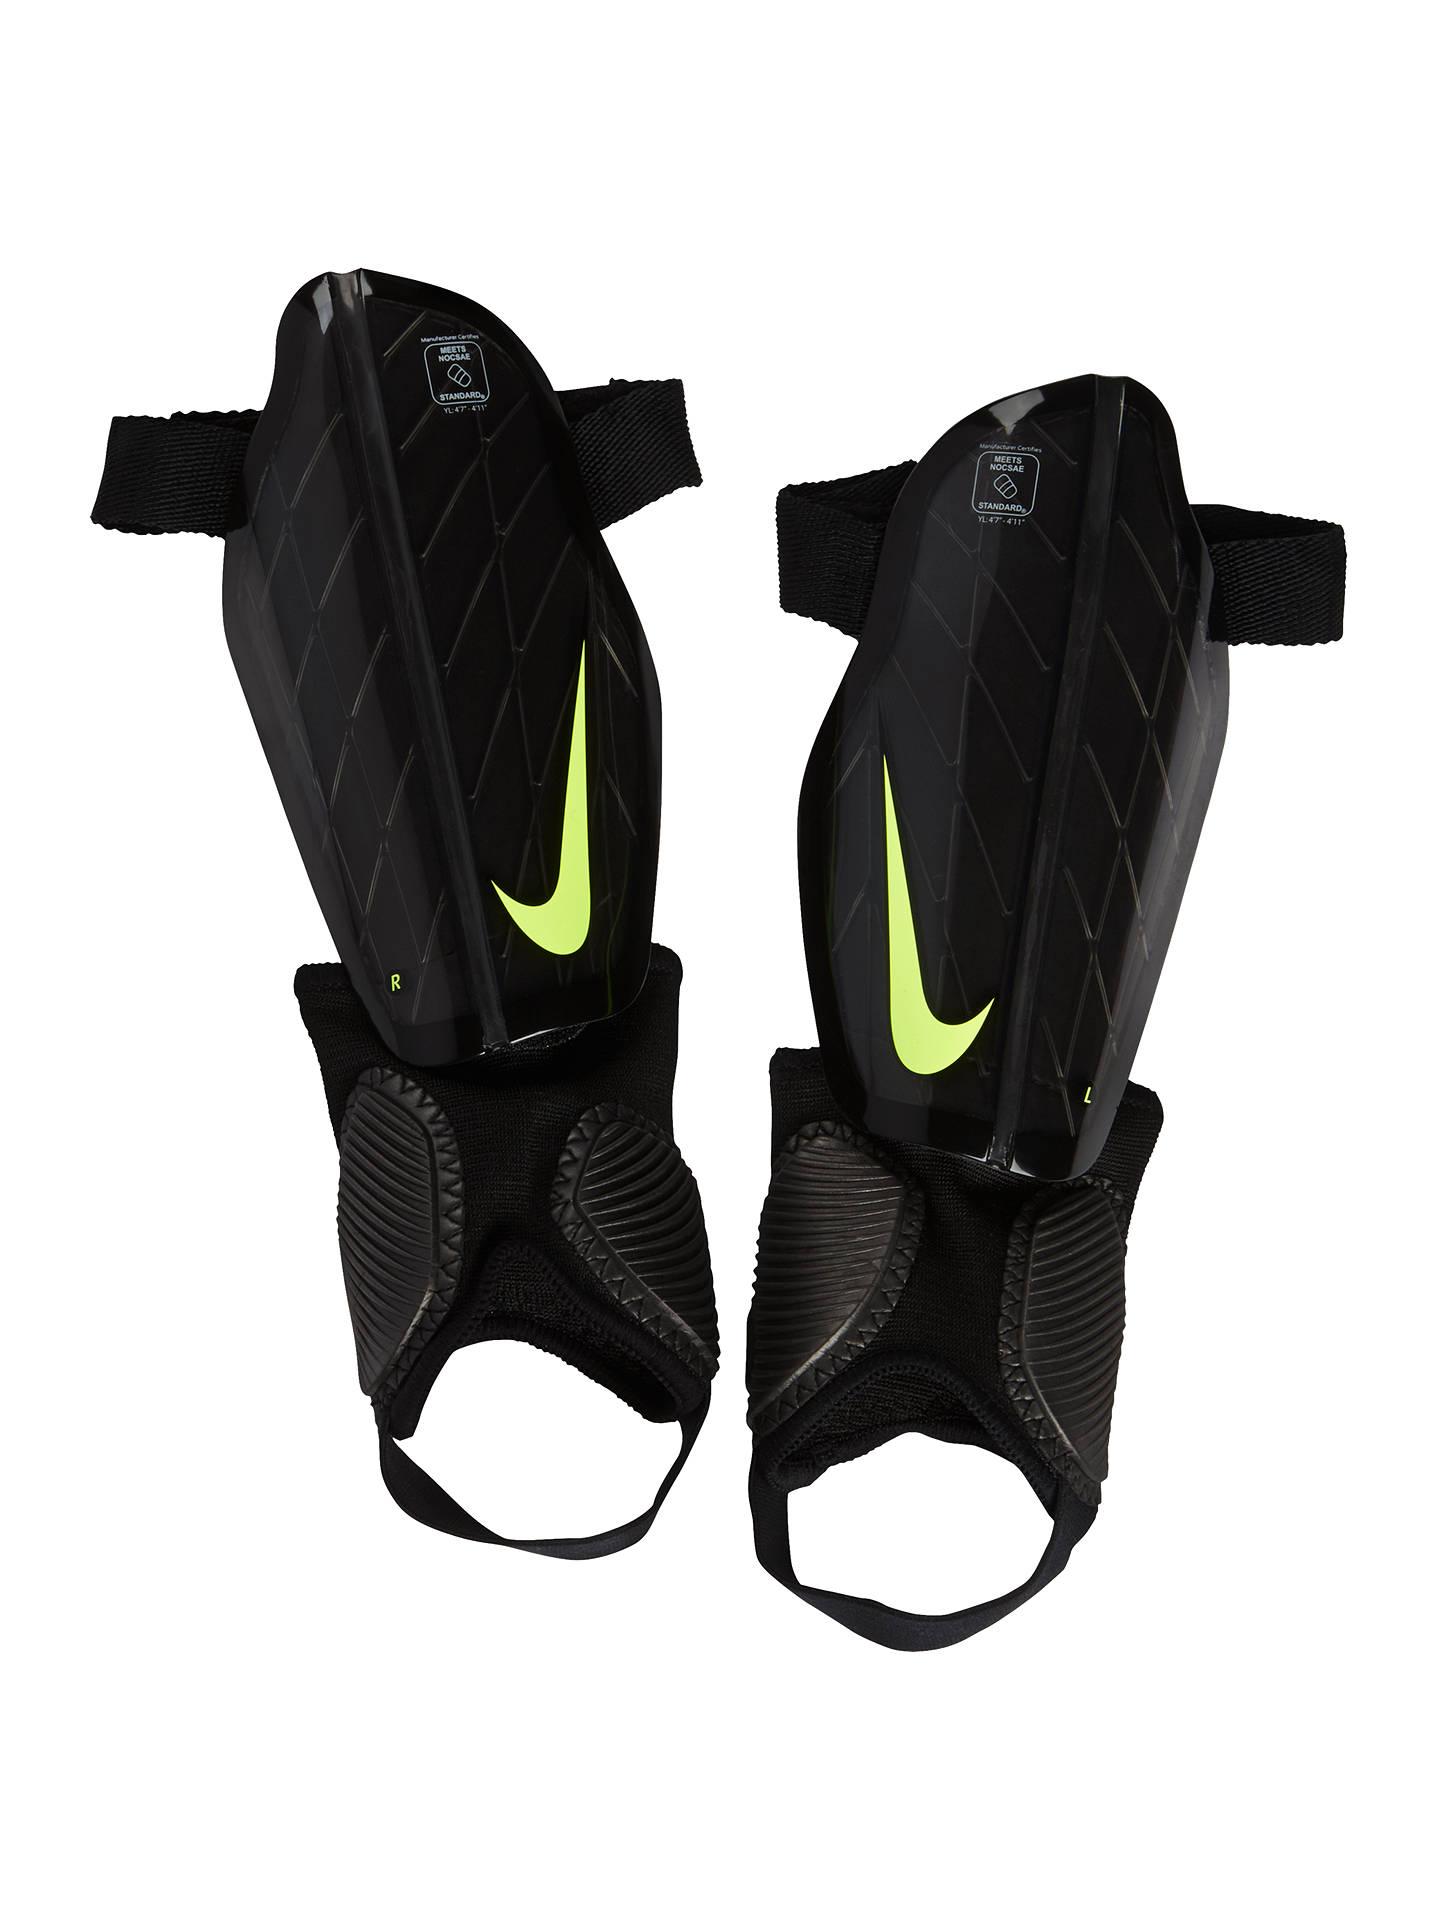 cfec4c6c3cc5 Buy Nike Children s Protegga Flex Football Shin Pads